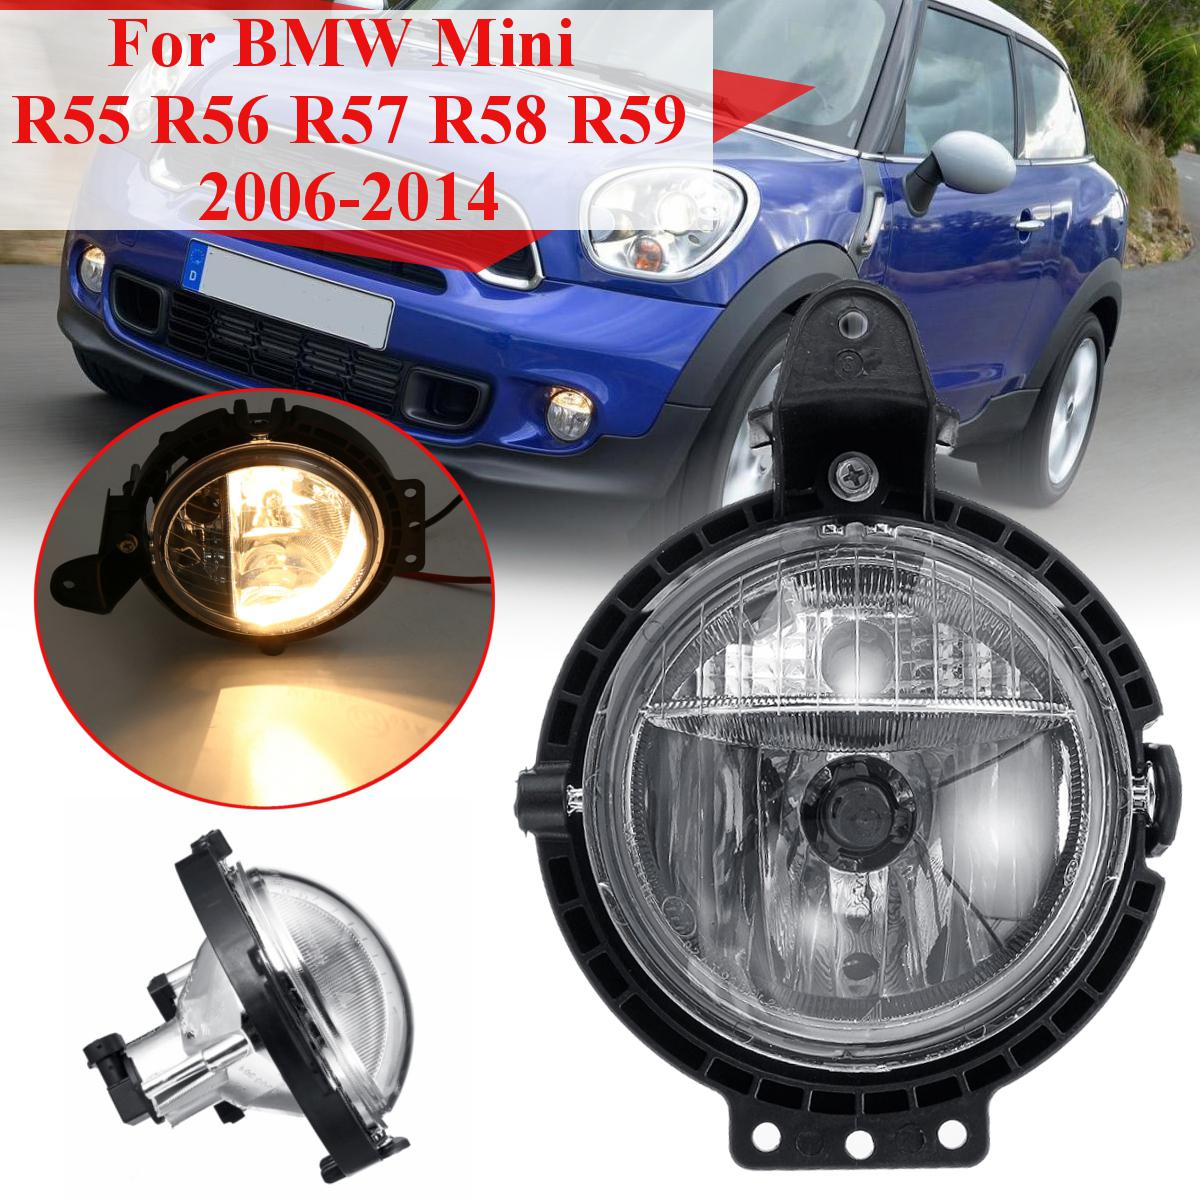 Car Front Bumper Fog Lights Lamp with Bulb Amber for BMW Mini R55 R56 R57 R58 R59 2006-2014